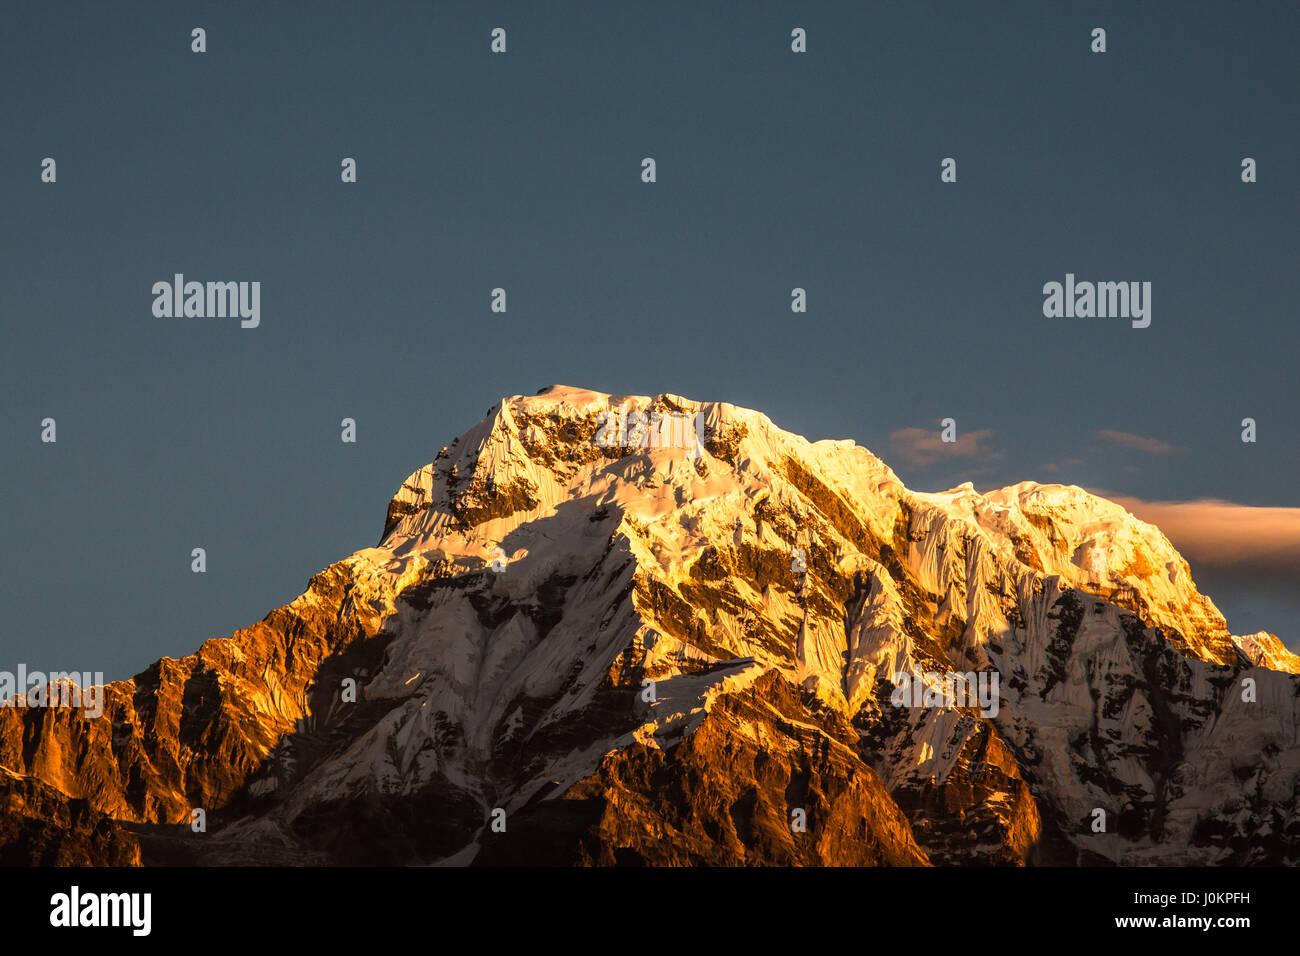 The beautiful sunset glow on Himalayan mountains near Annapurna I and II - Stock Image